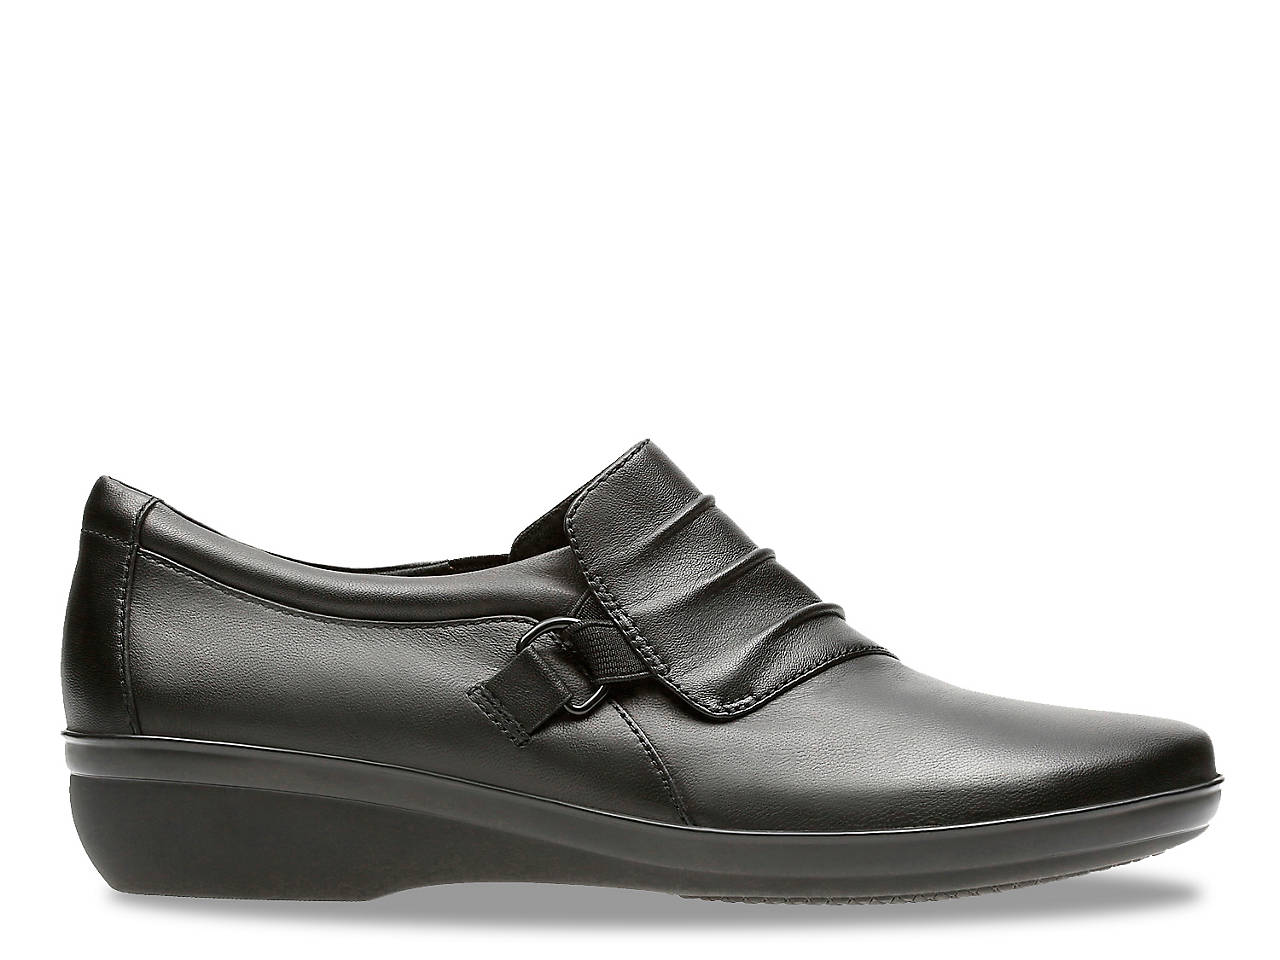 fd86a7d1d65 Clarks Everlay Heidi Wedge Slip-On Women s Shoes